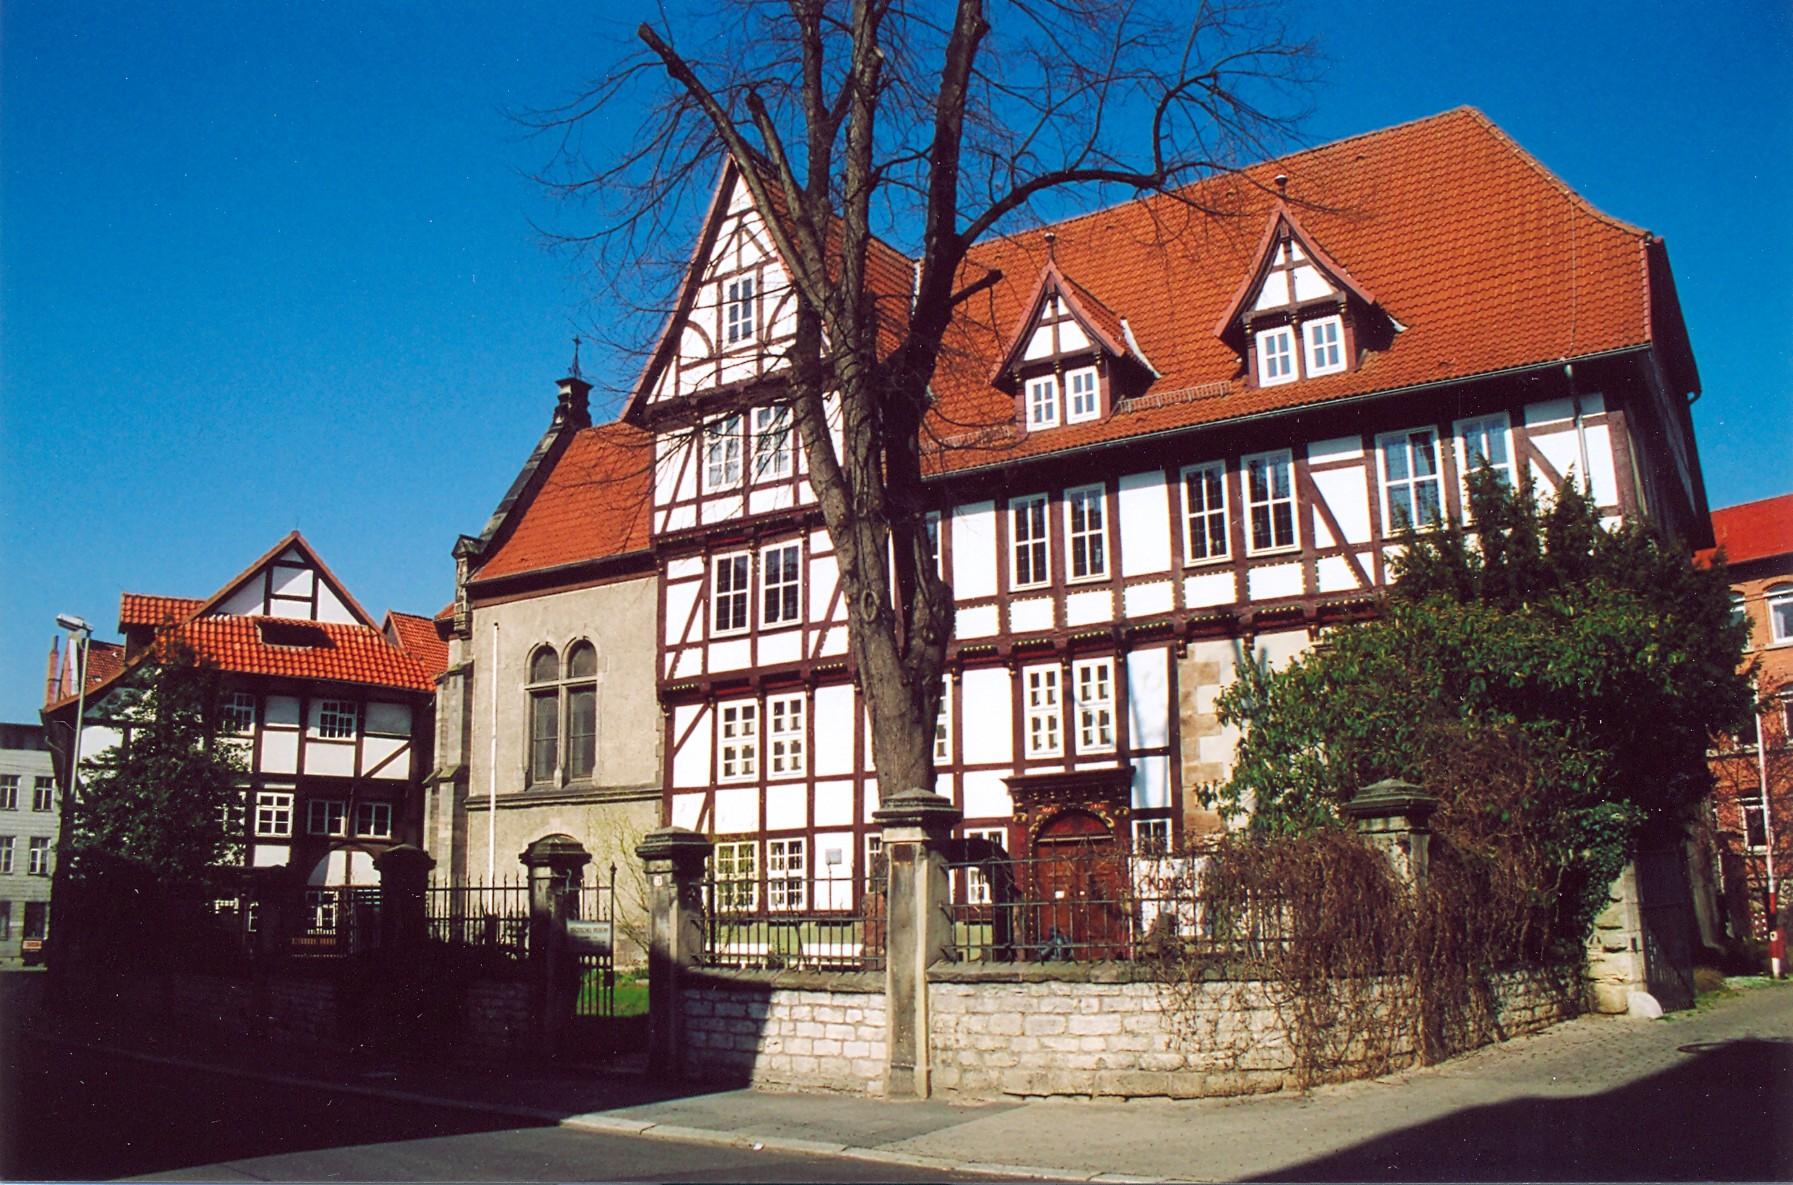 Städtisches Museum Göttingen